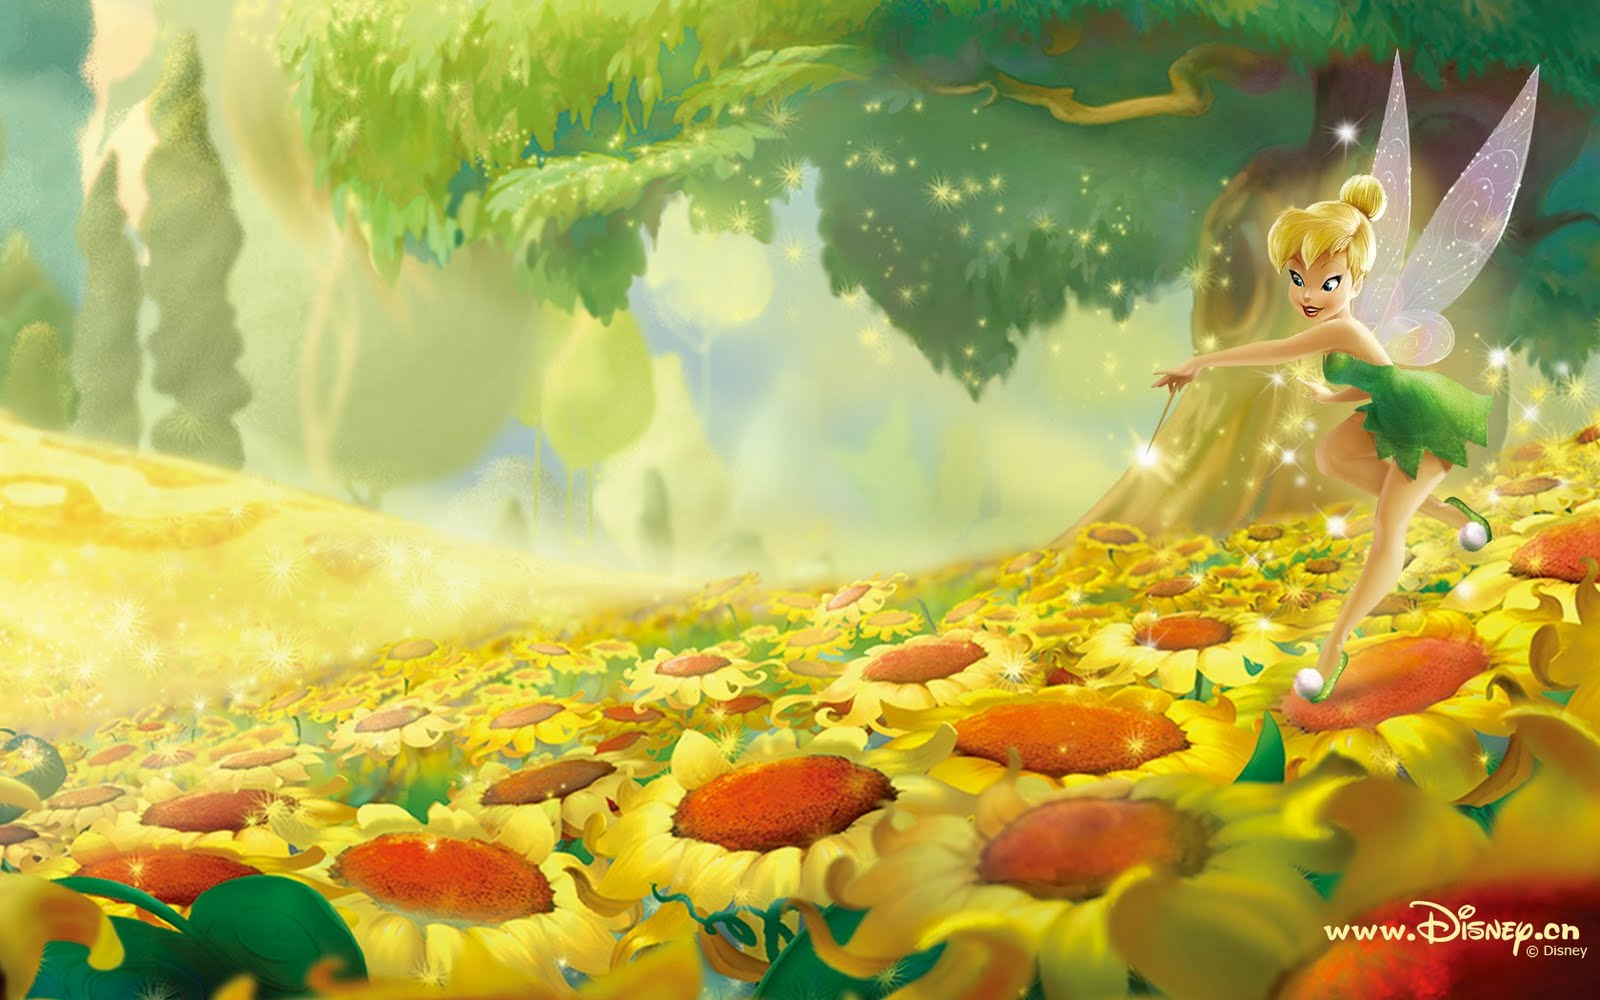 http://3.bp.blogspot.com/-8_osL27DSy4/Td3B-FGcBuI/AAAAAAAACQg/mlw-7KXrea4/s1600/Disney+Princess+Wallpaper+9.jpg